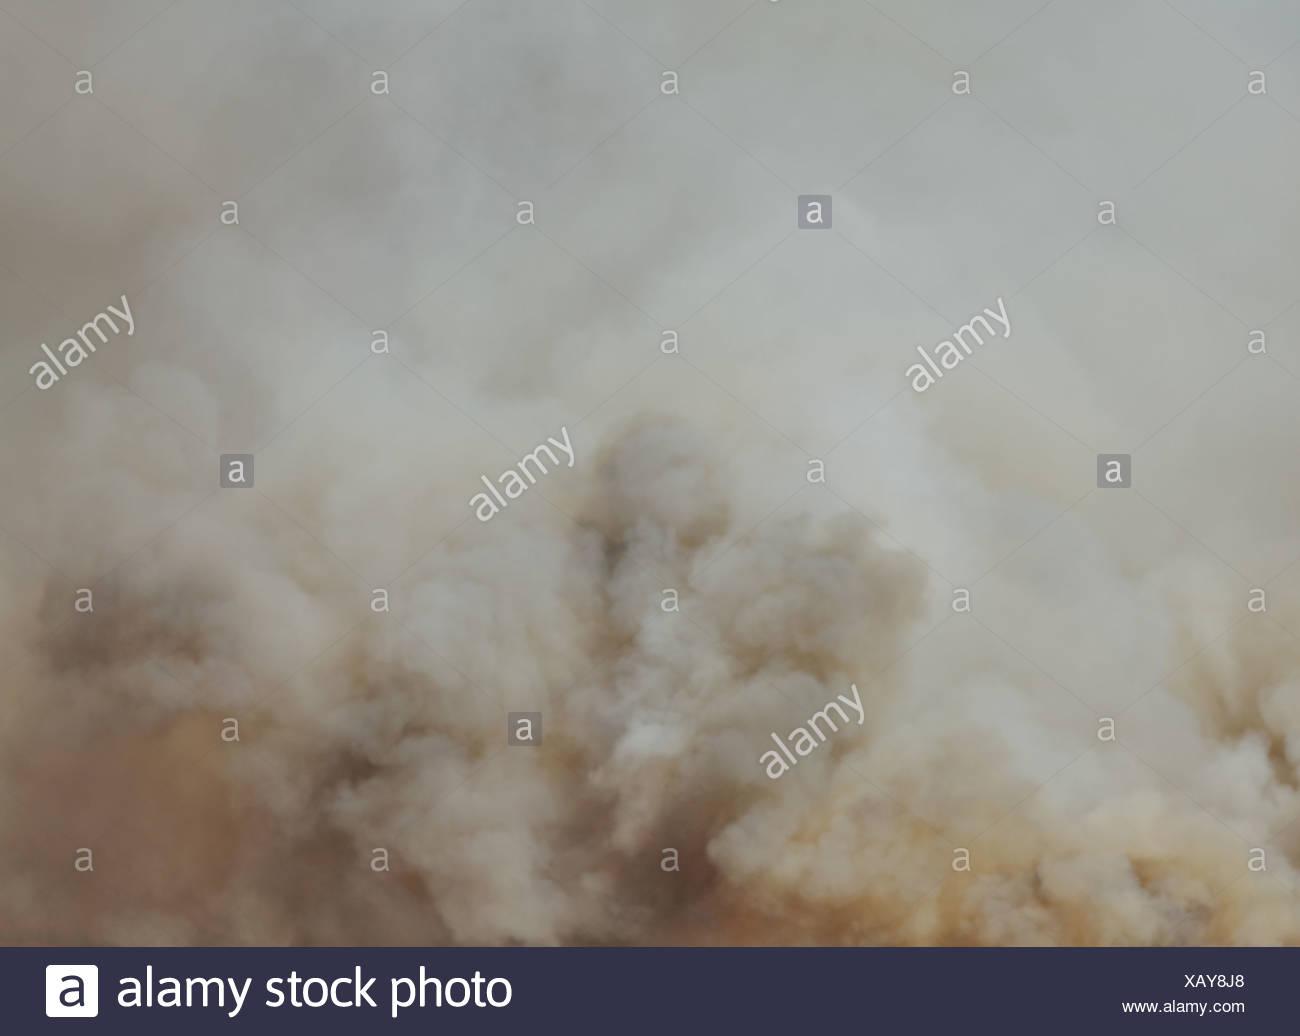 Washington state USA large forest fire Ellensburg Kittitas county - Stock Image